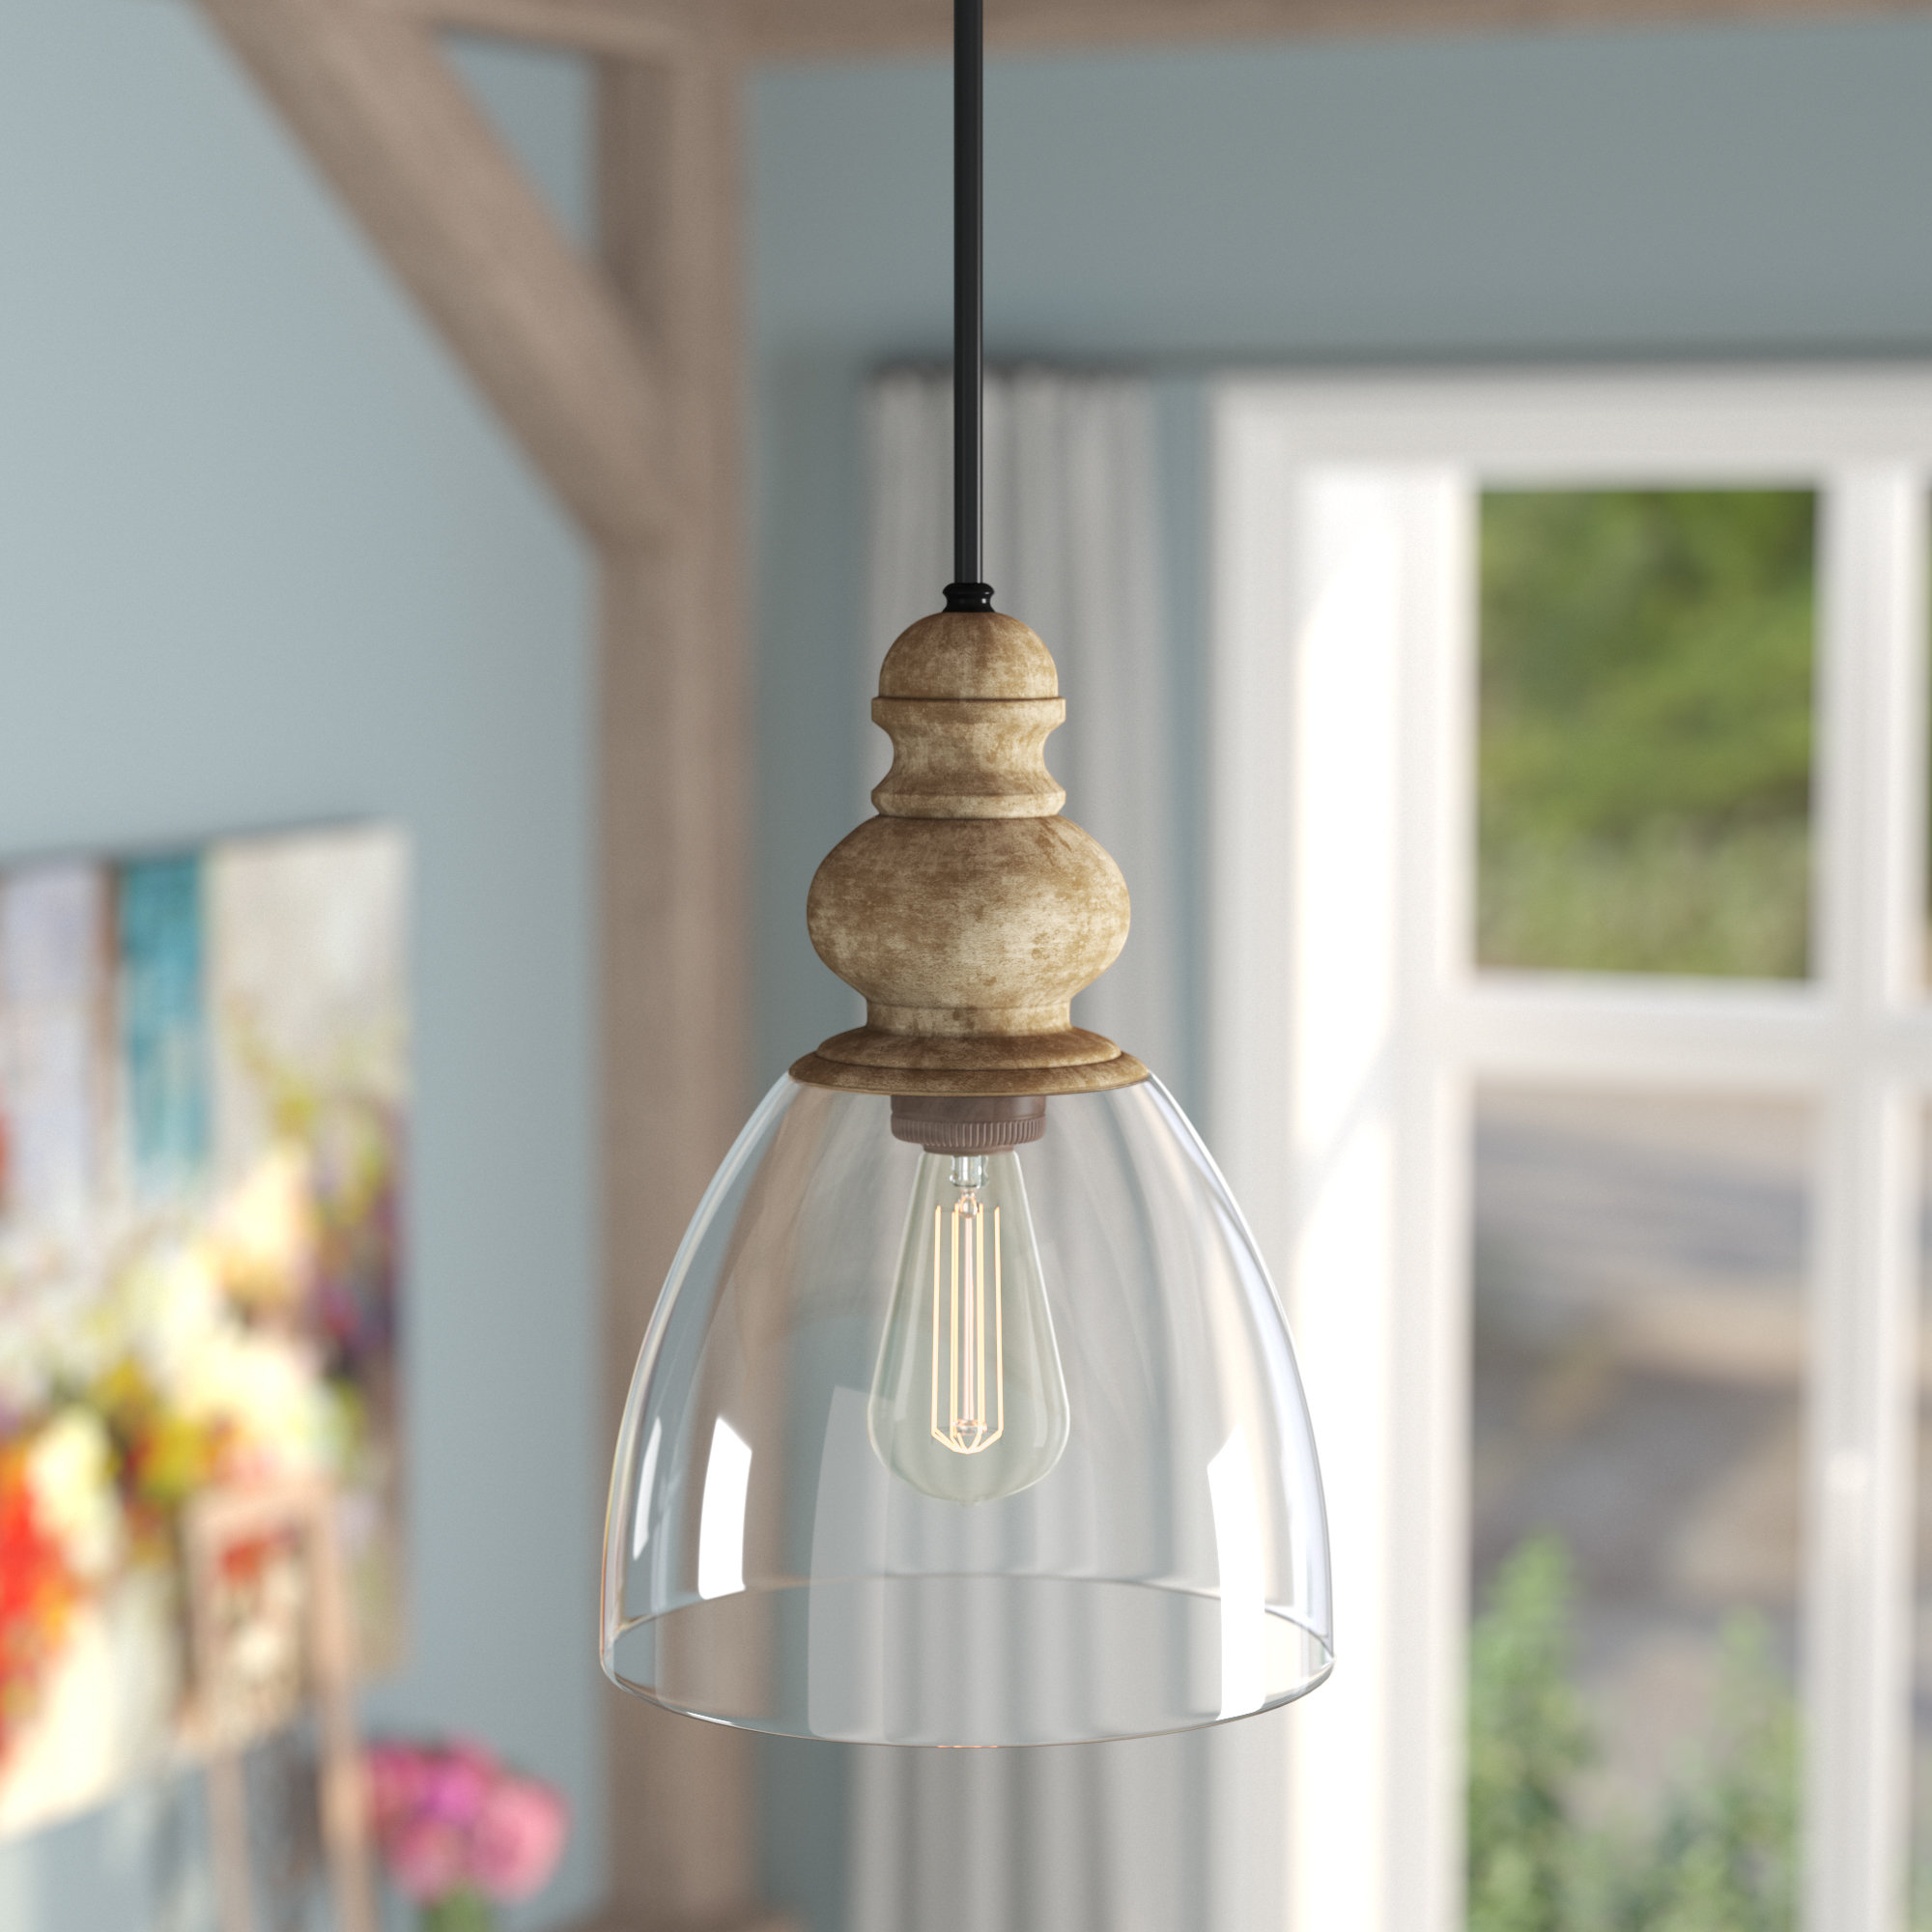 Recent Laurel Foundry Modern Farmhouse Lemelle 1 Light Single Bell With Regard To Carey 1 Light Single Bell Pendants (Gallery 6 of 20)